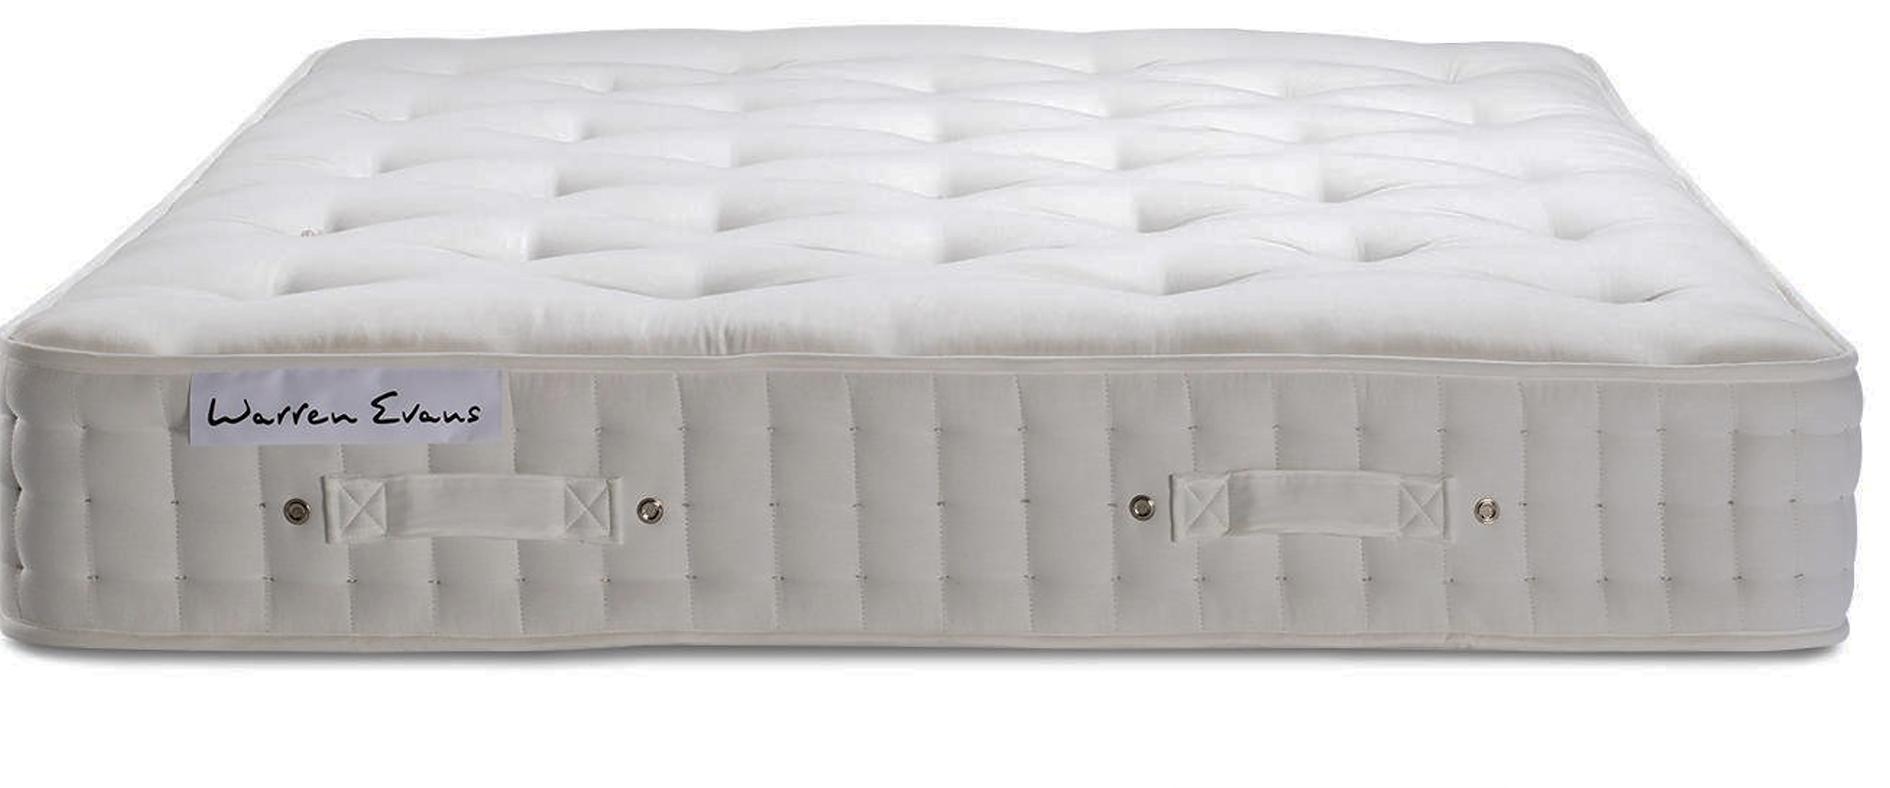 Warren Evans 6000 organic wool mattress, top to its mattress range. It's firm but sink-unable